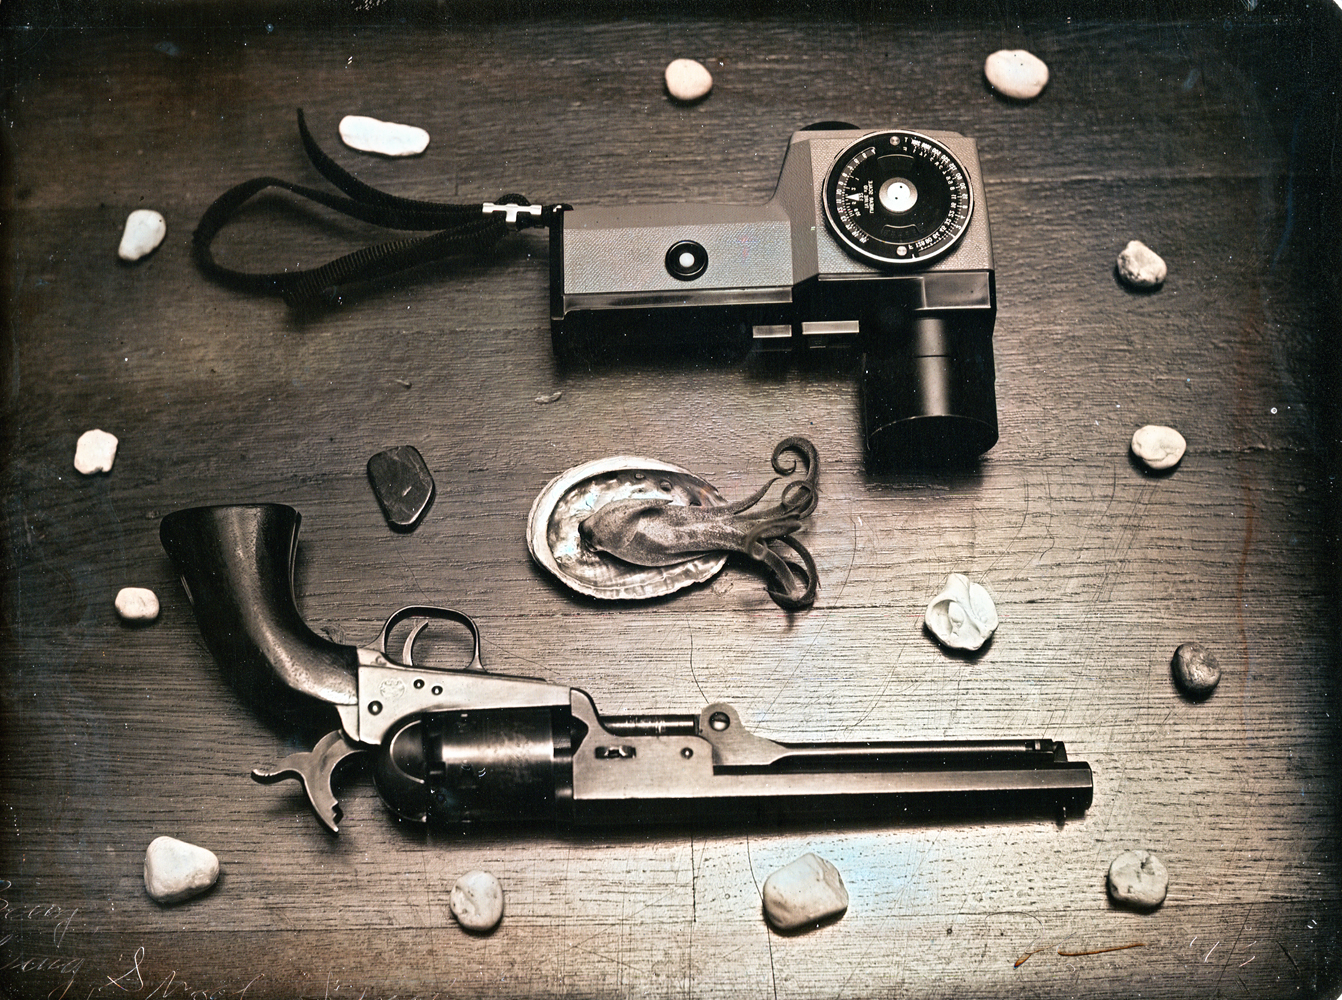 Daniel Carrillo, Bang Bang Shoot Shoot, 2012, daguerreotype, 4.25 x 3.25 inches, framed, $1200.